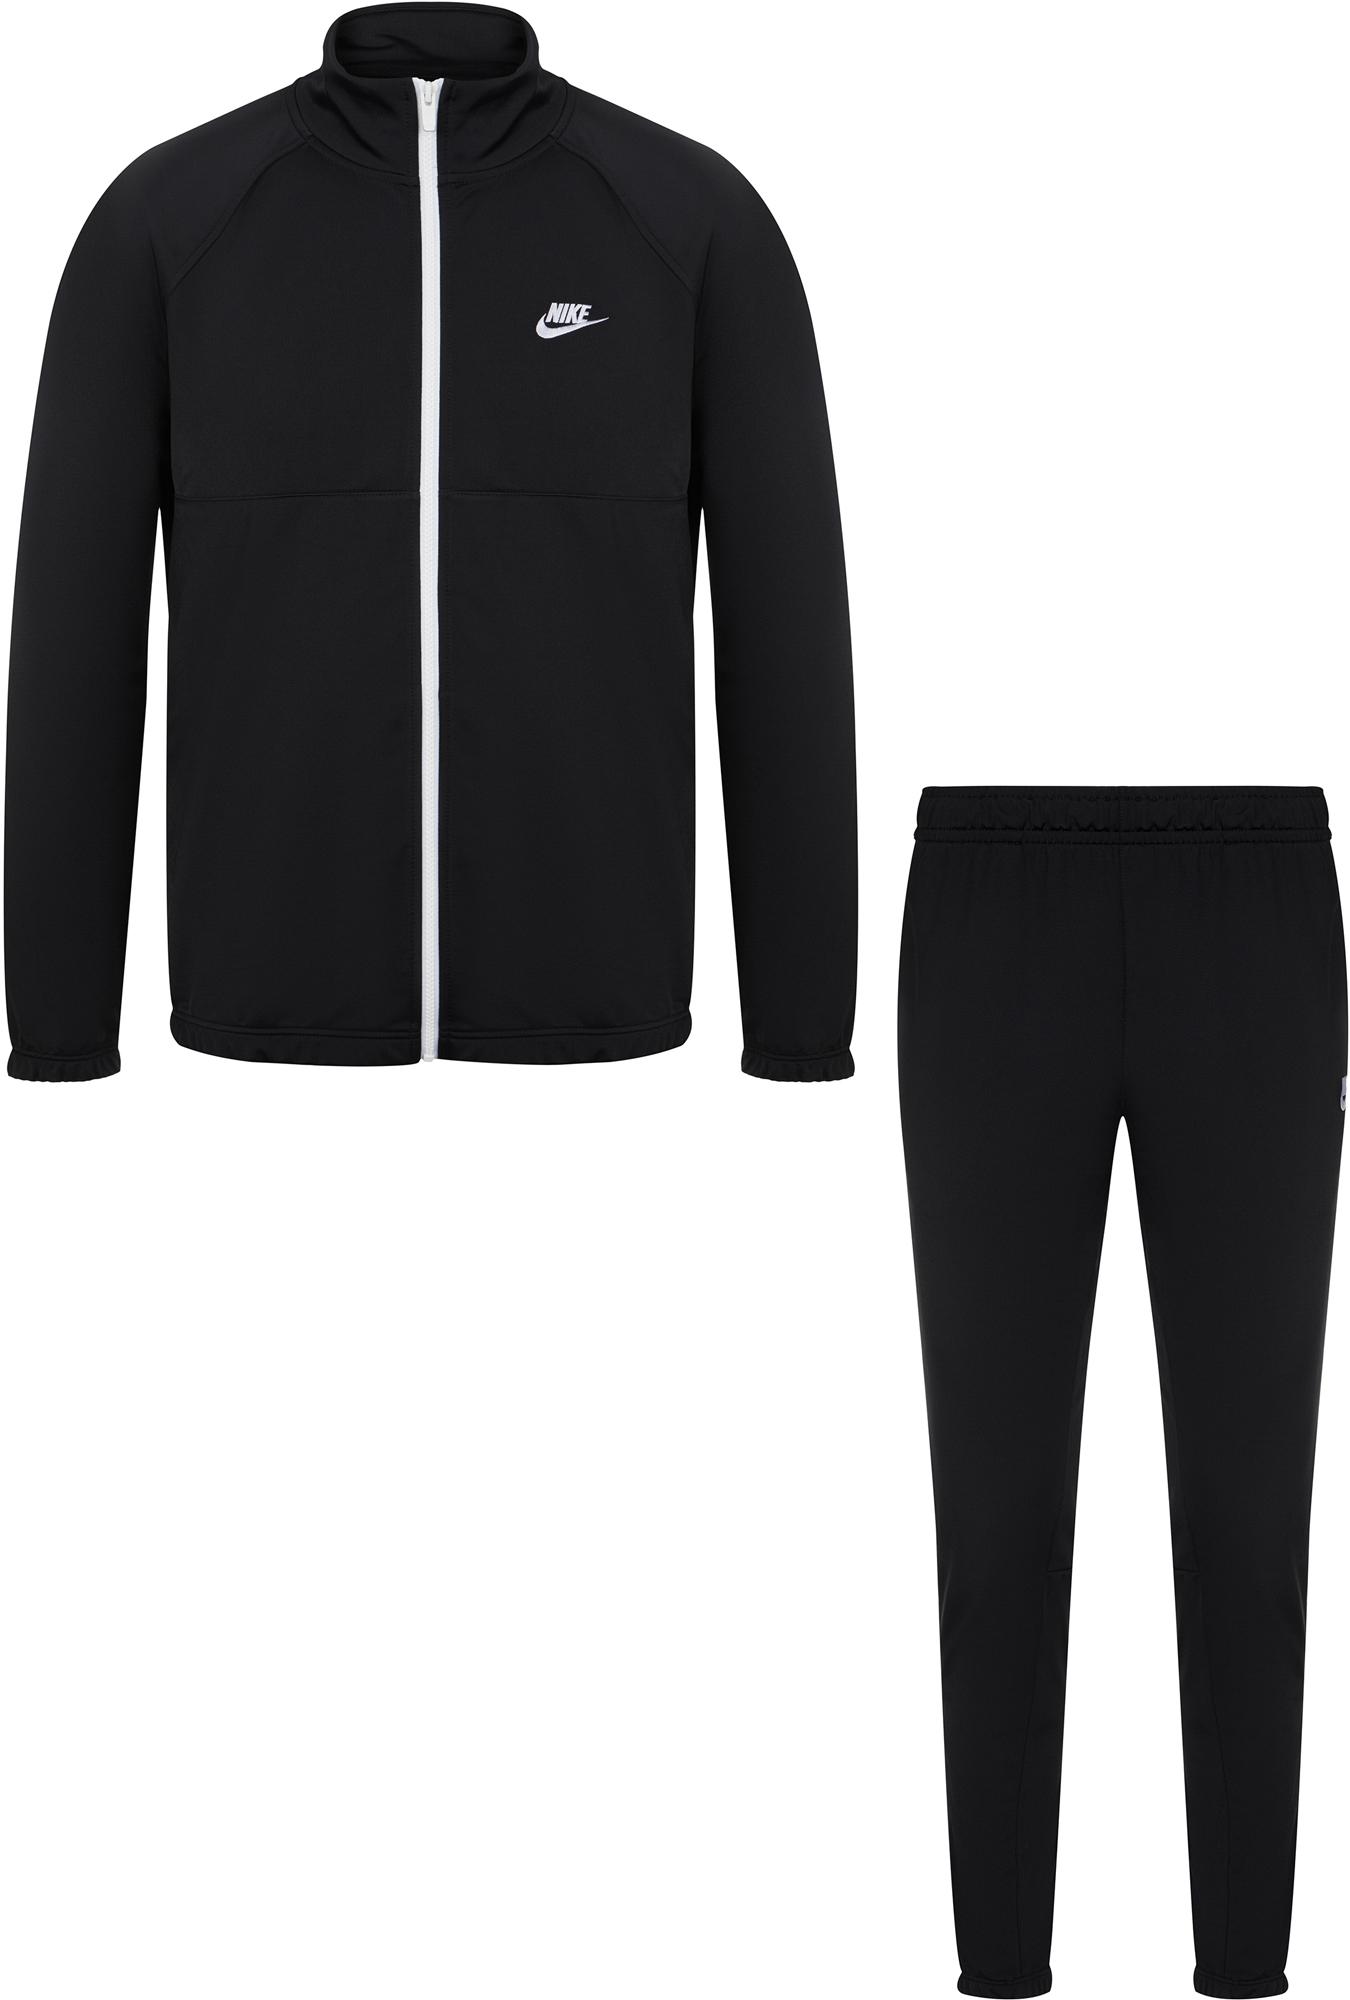 Nike Костюм мужской Sportswear, размер 52-54